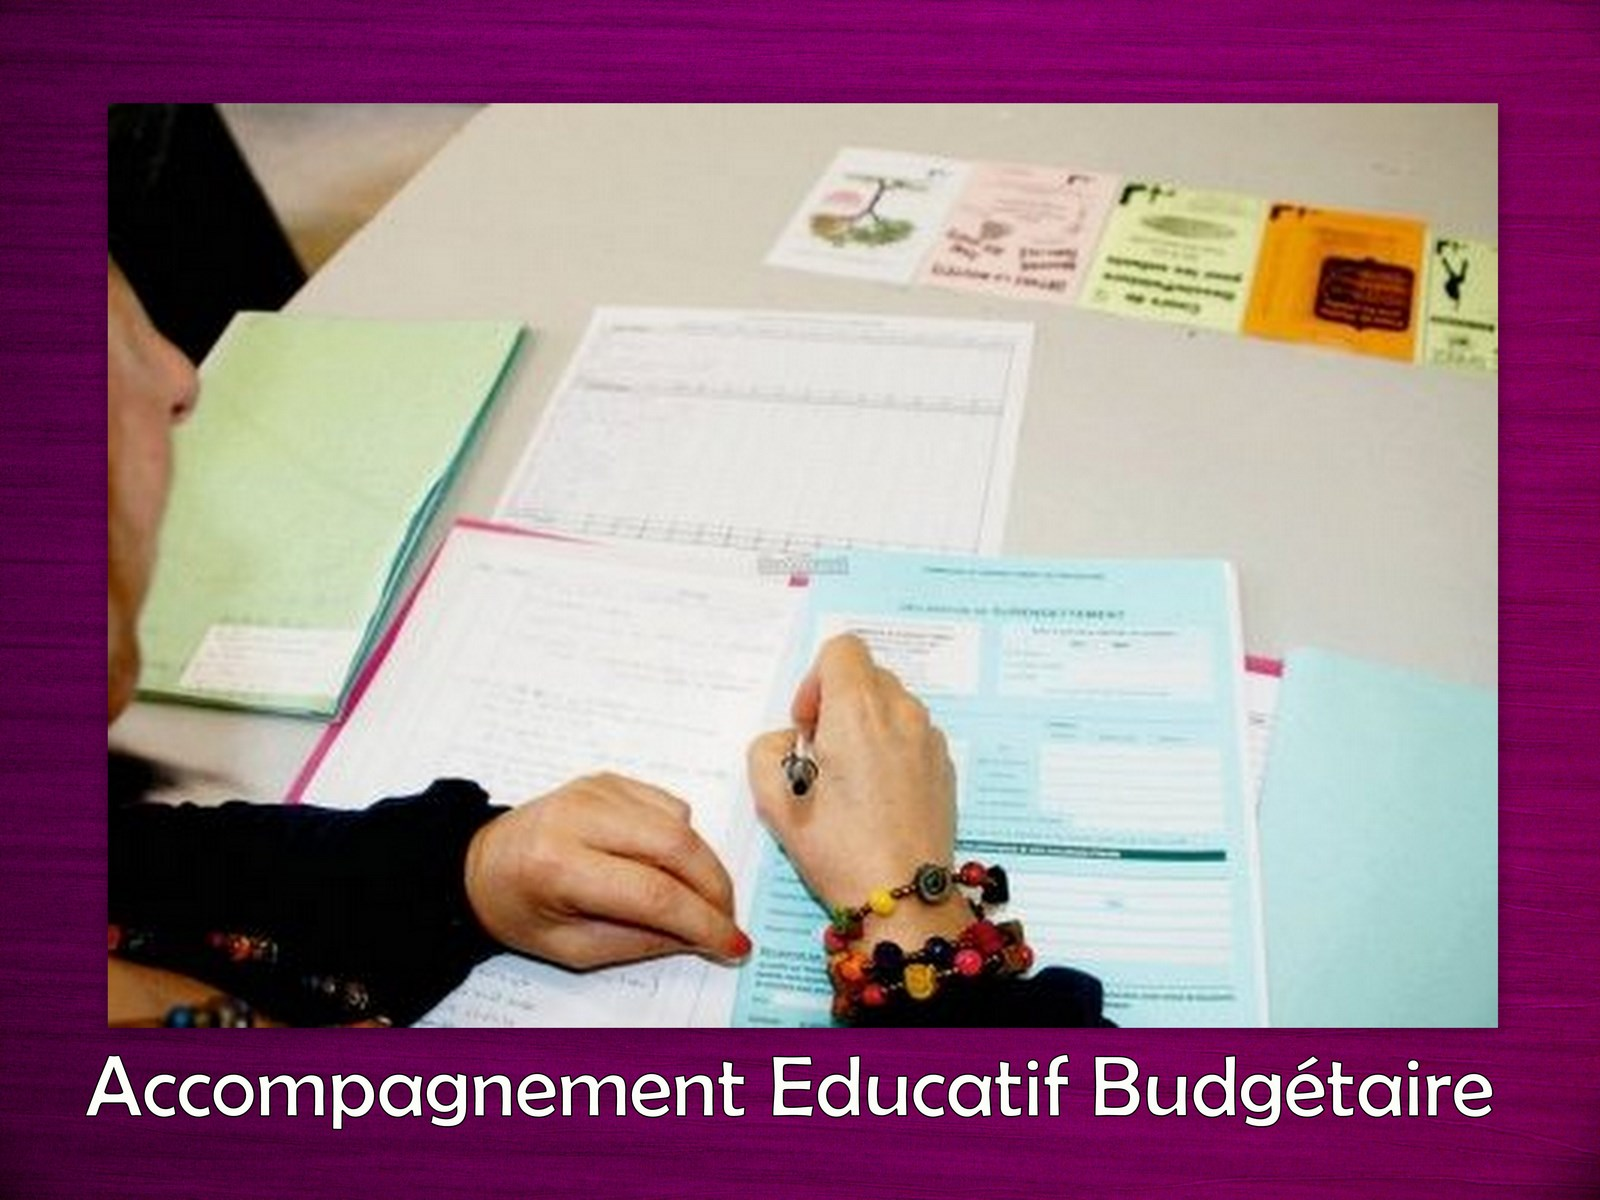 Acc Educ Budget